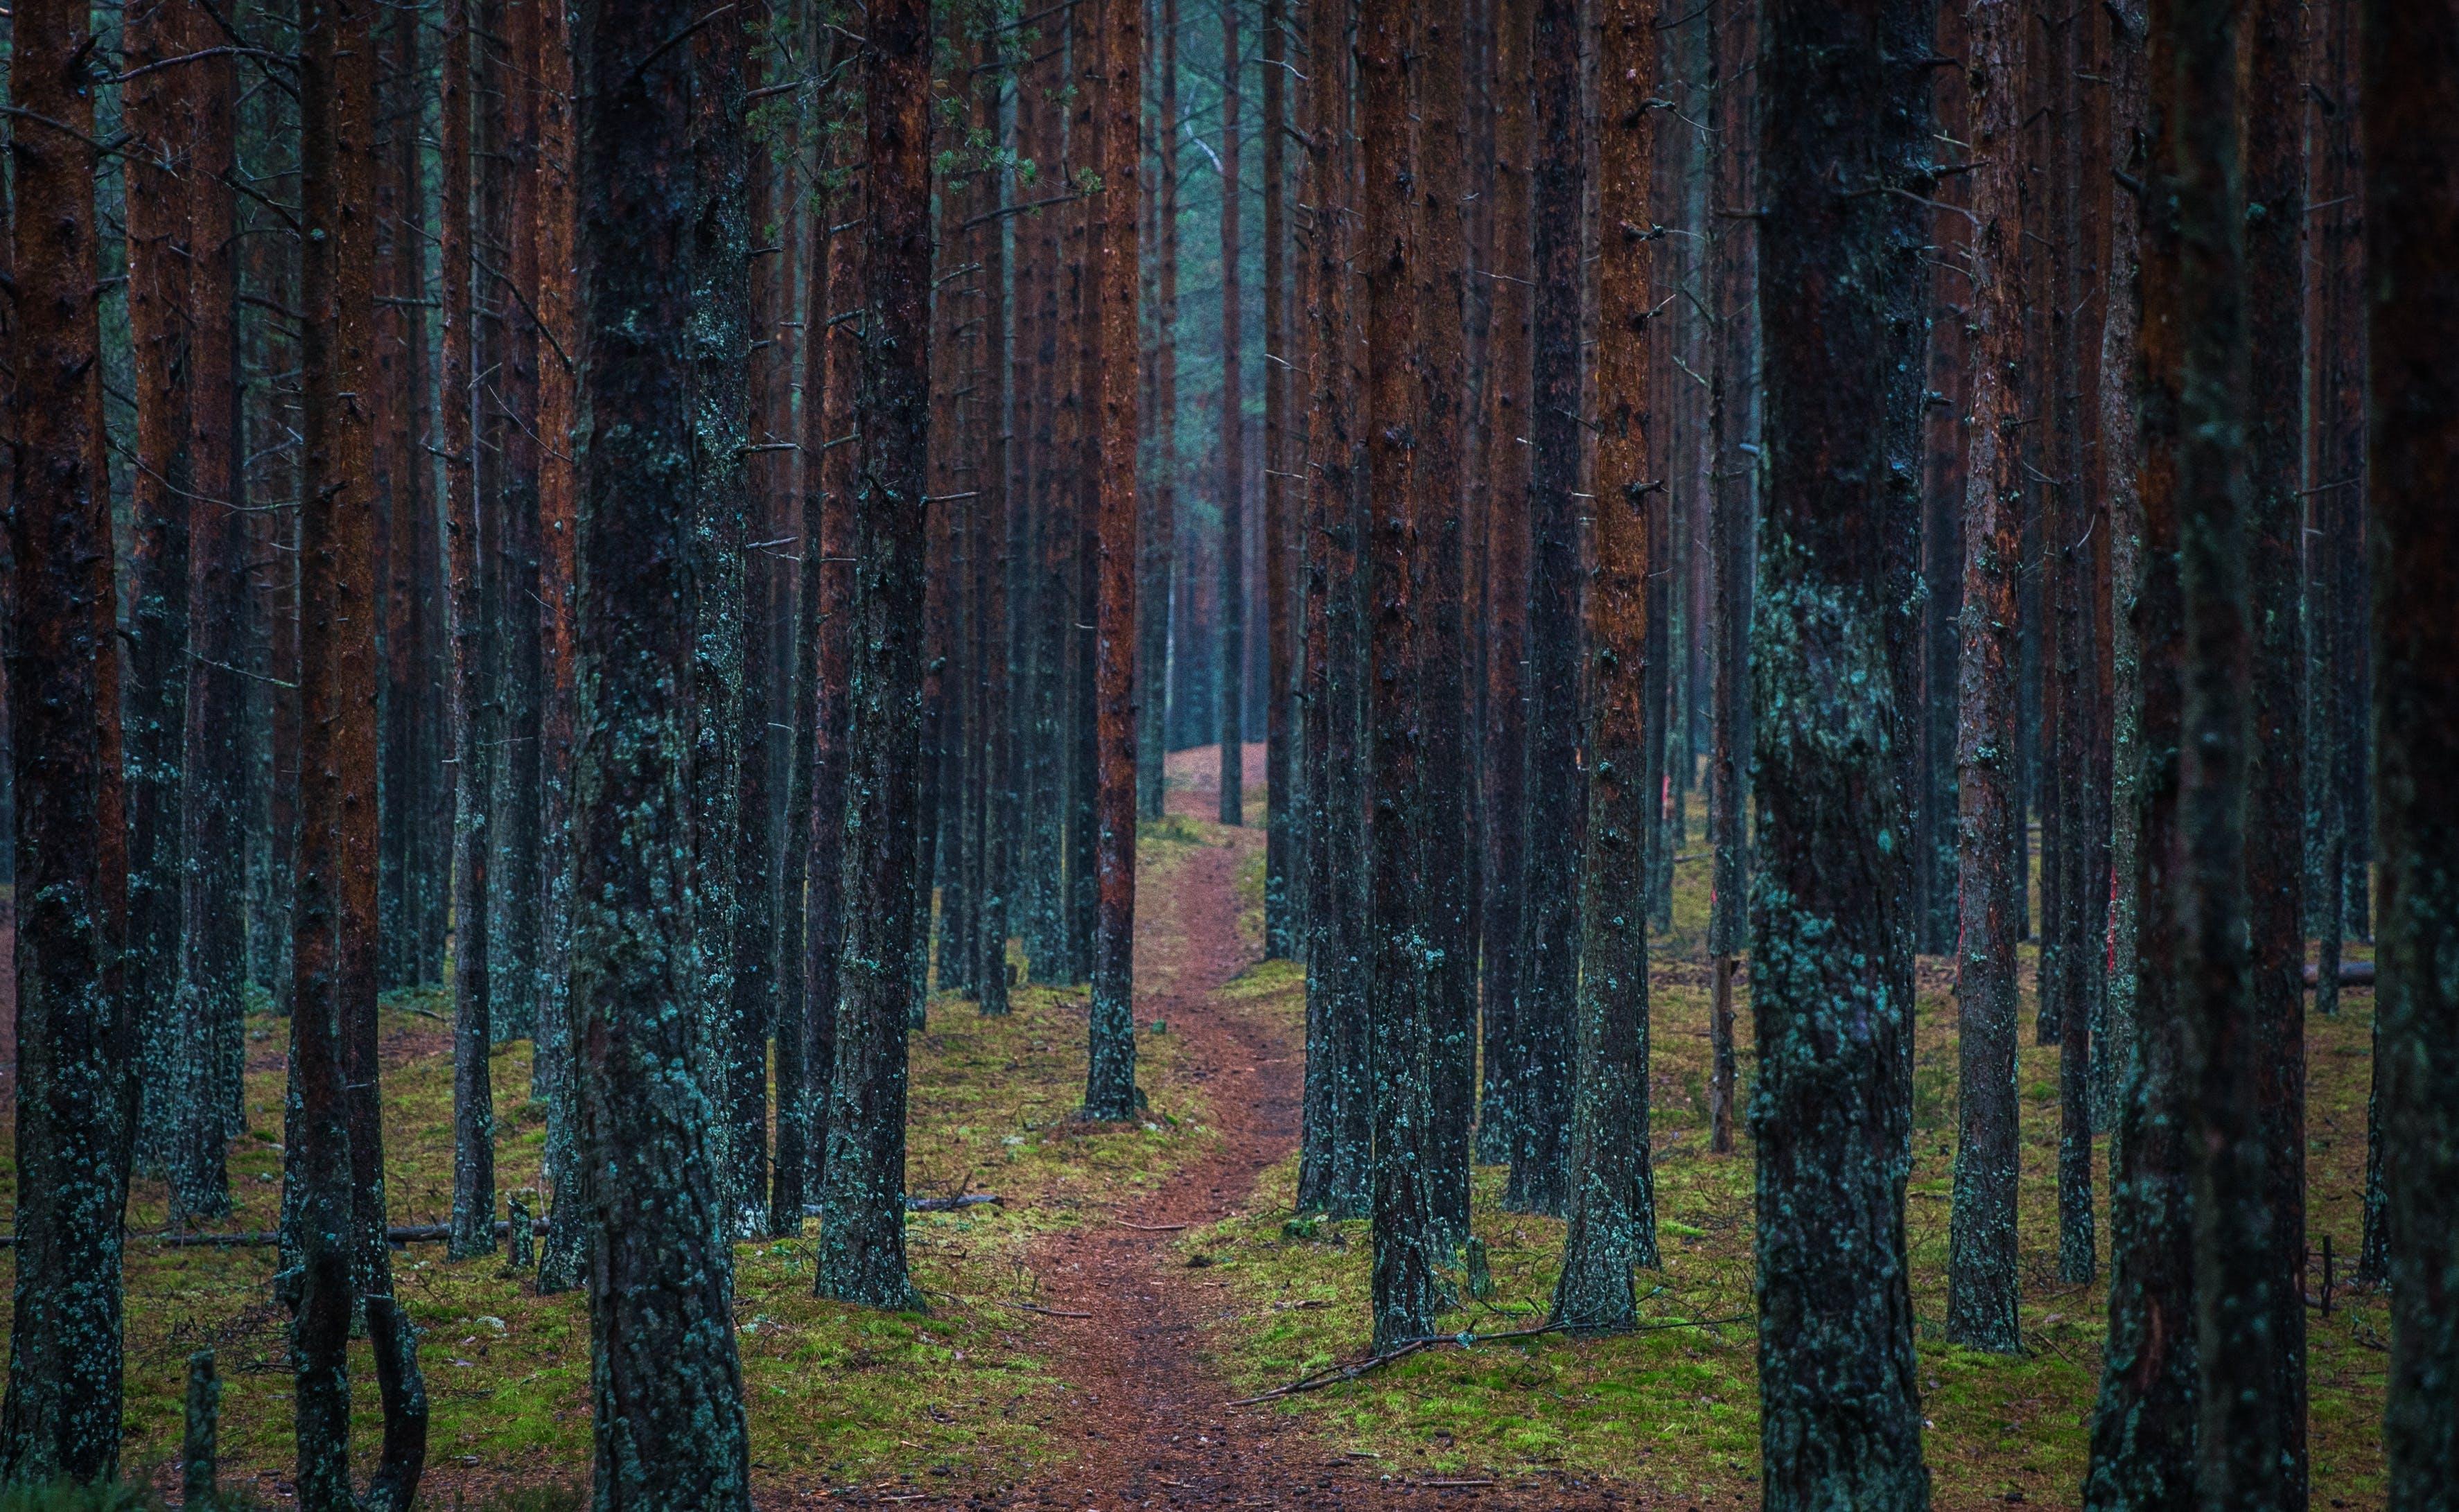 Road Between Tall Tress Photo